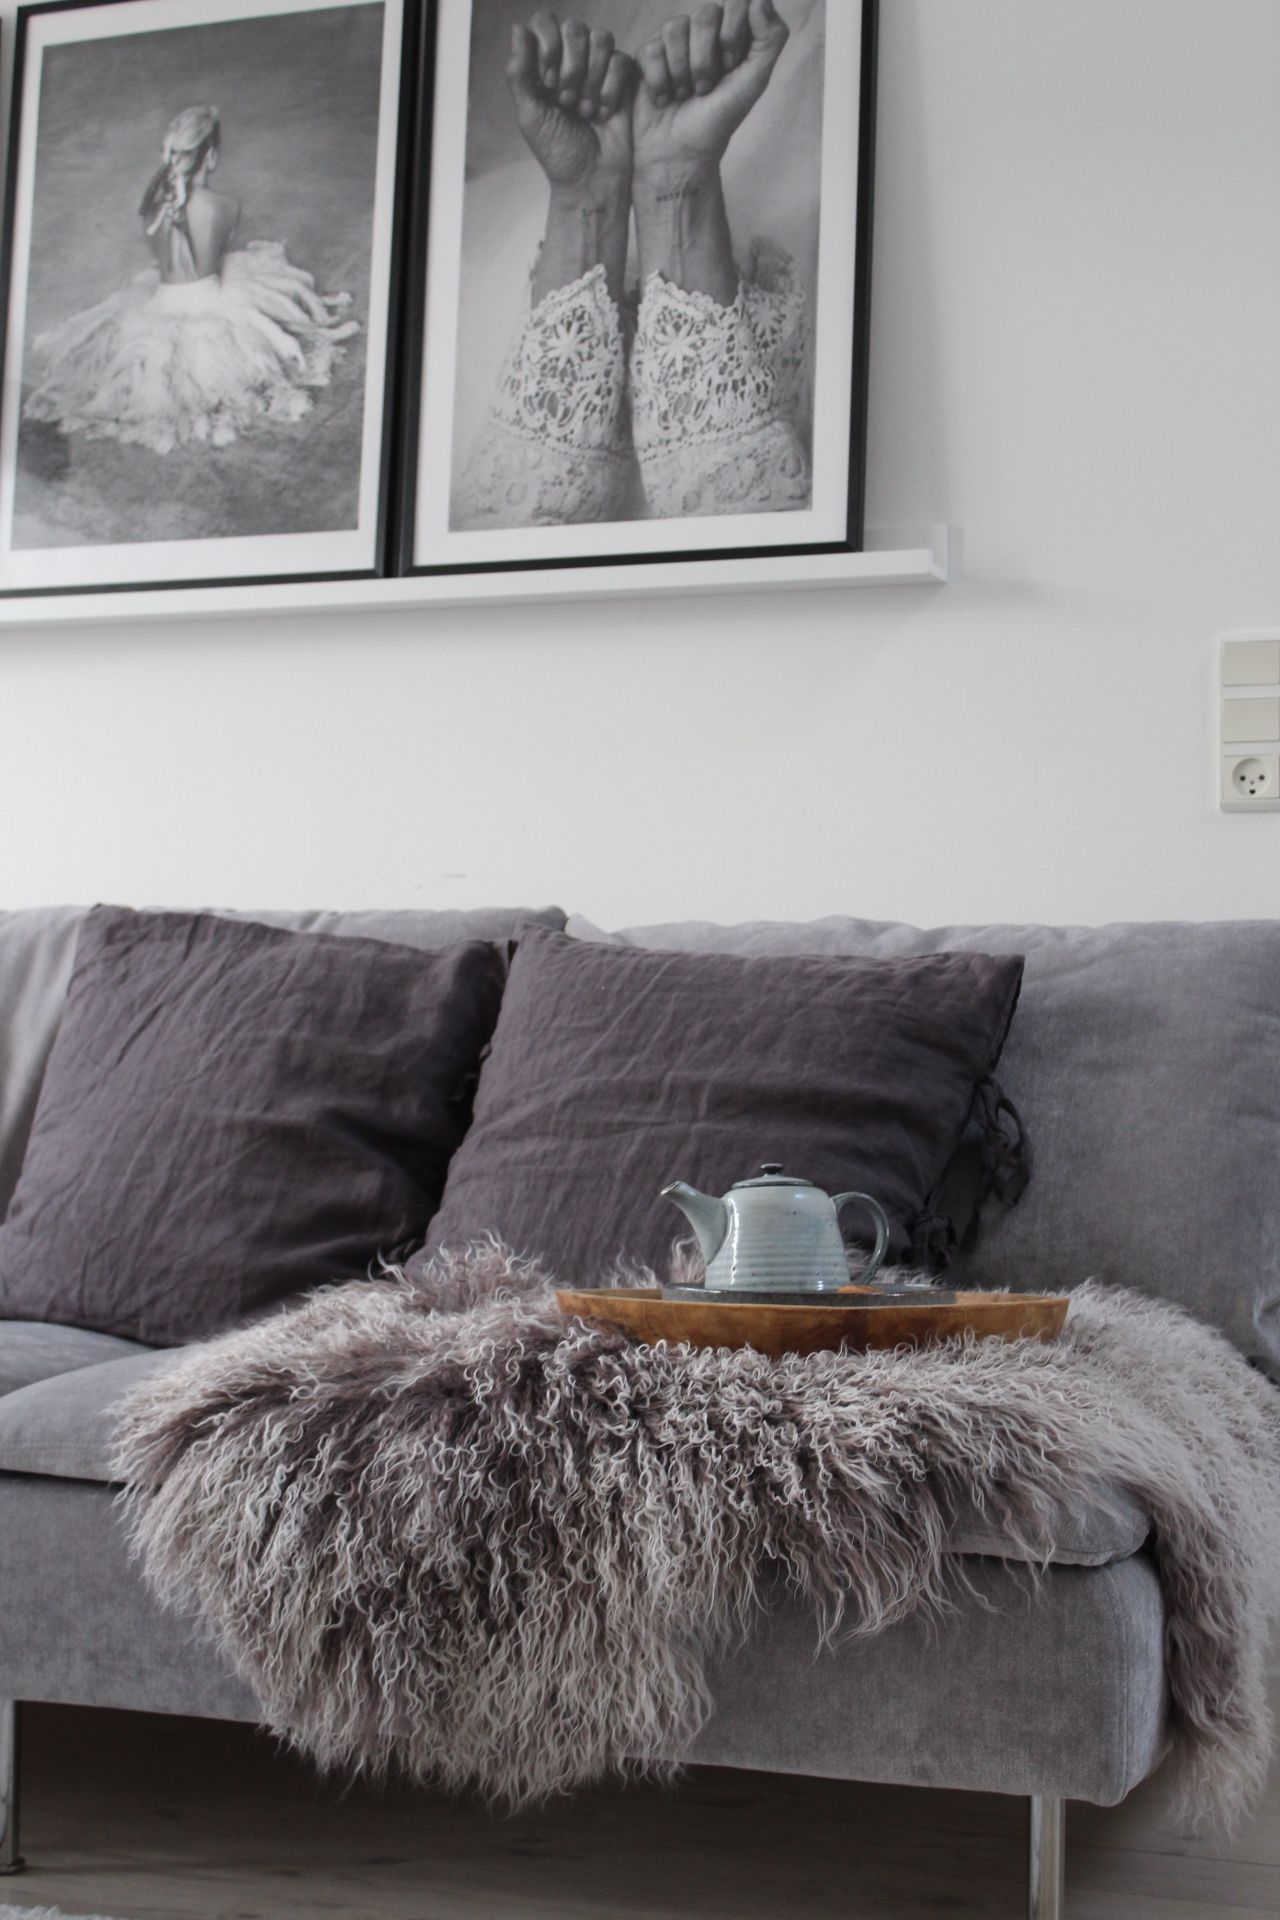 Cool Scandinavian Inspired Living Room With A Grey Velvet Sofa Black And White Photo Art Ben Velvet Couch Living Room Living Room Scandinavian Sofa Styling